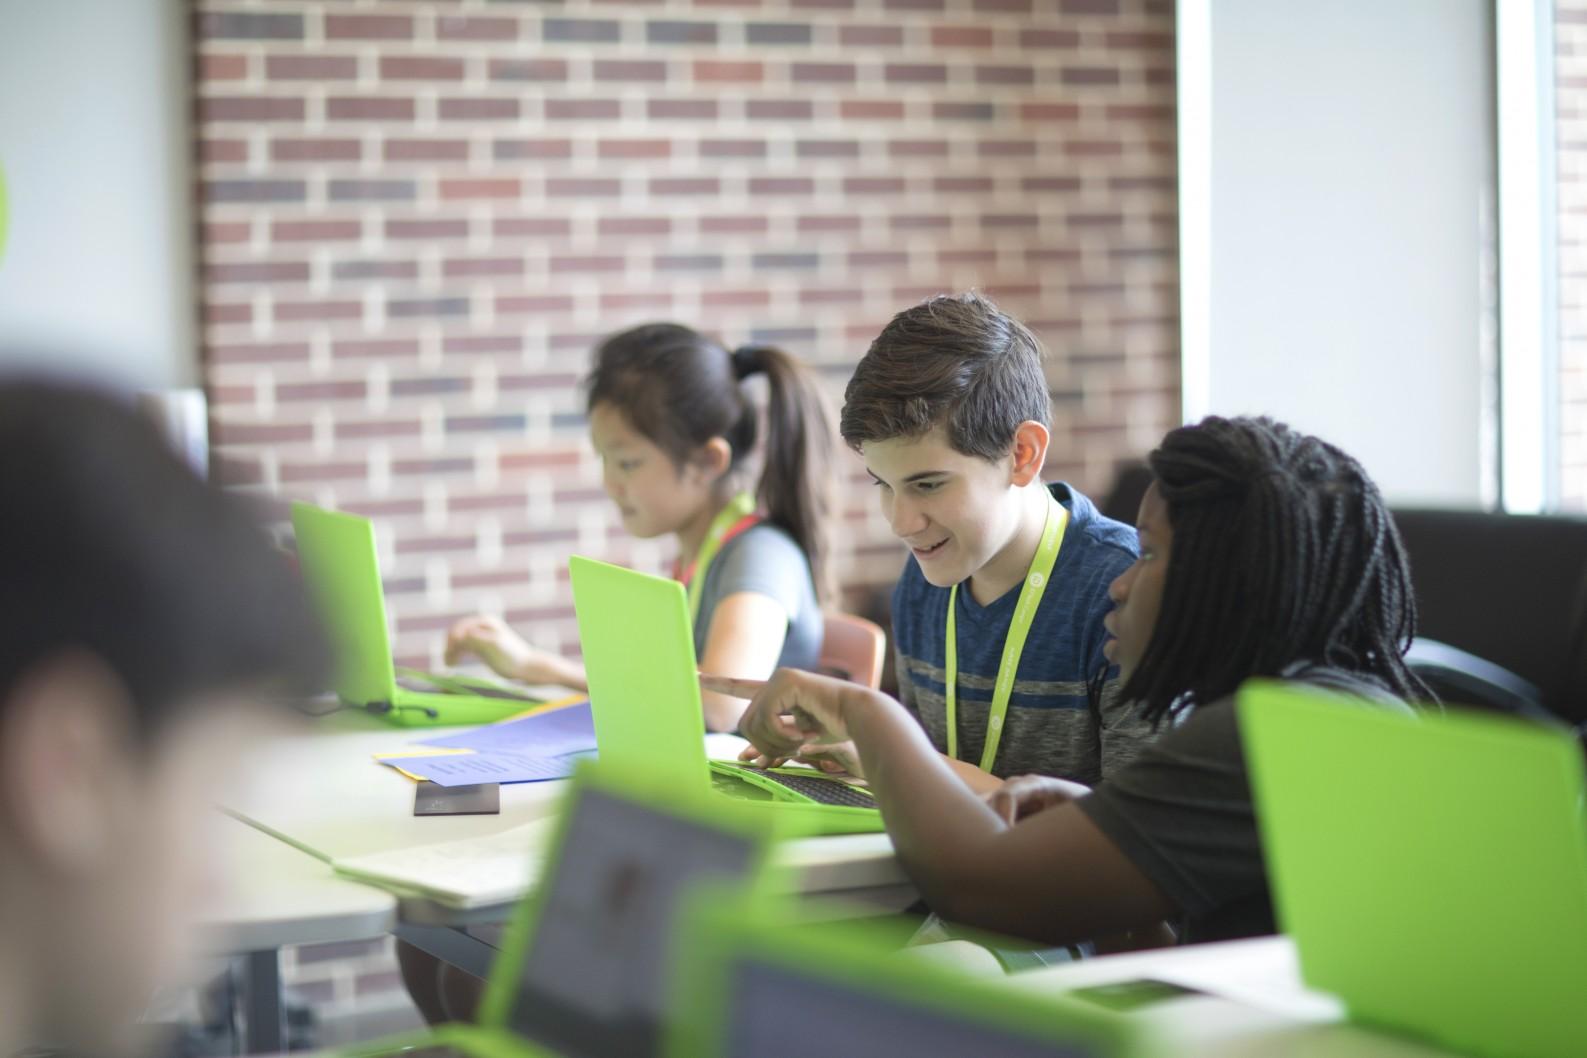 Summer Program - Engineering | iD Tech Camps | Held at Adelphi University